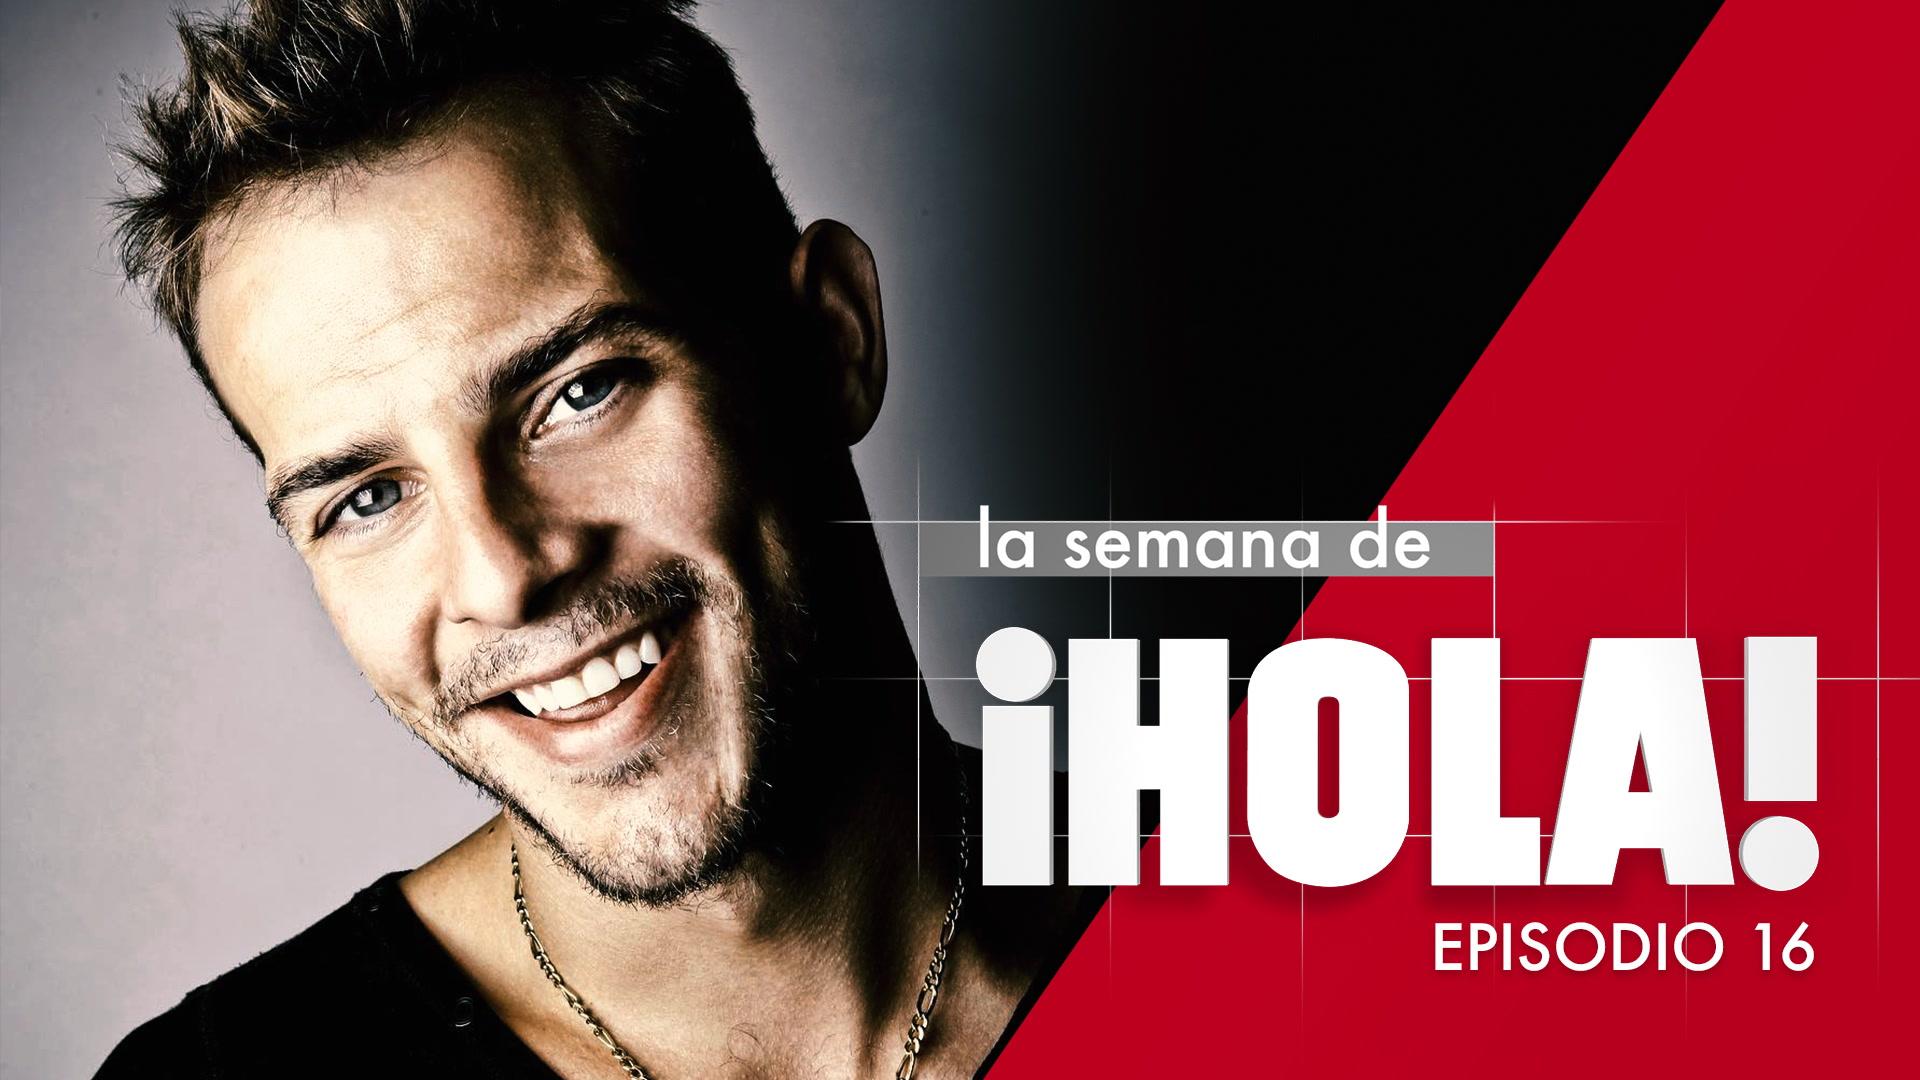 La semana de ¡HOLA! - Episodio 16